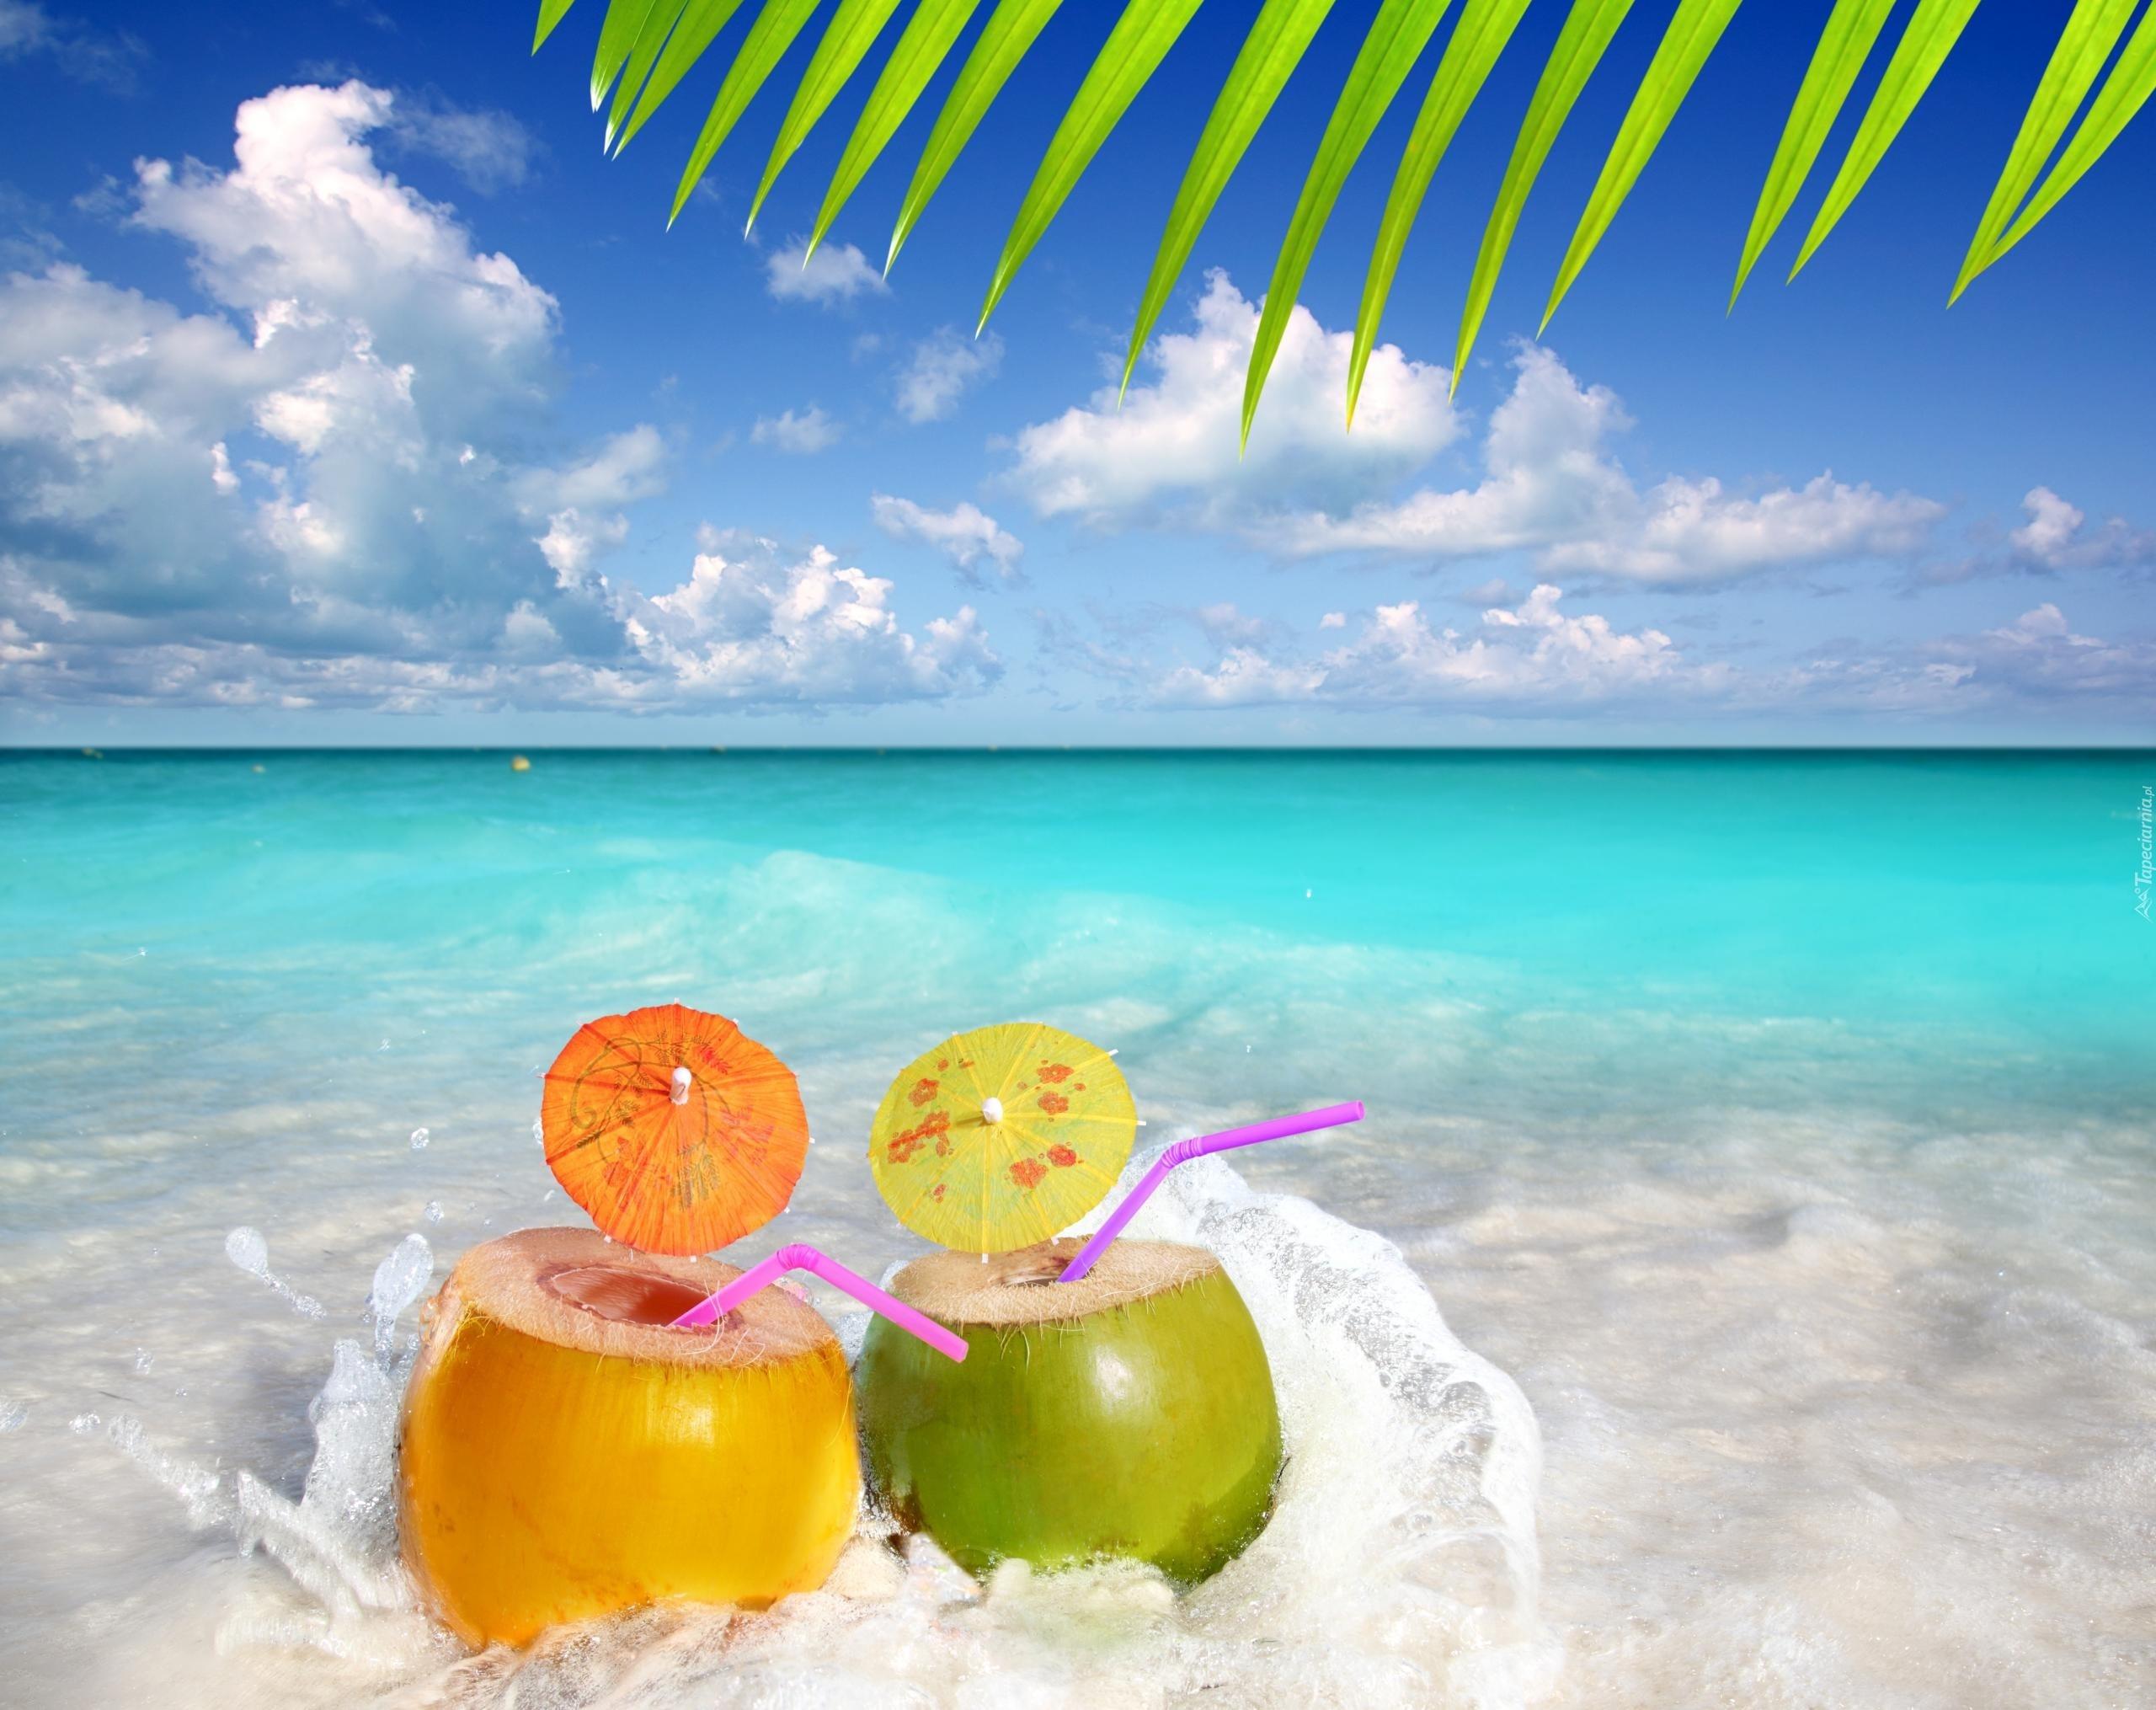 Sailboat Holiday Summer 4k Hd Desktop Wallpaper For 4k: Morze, Drinki, Liść